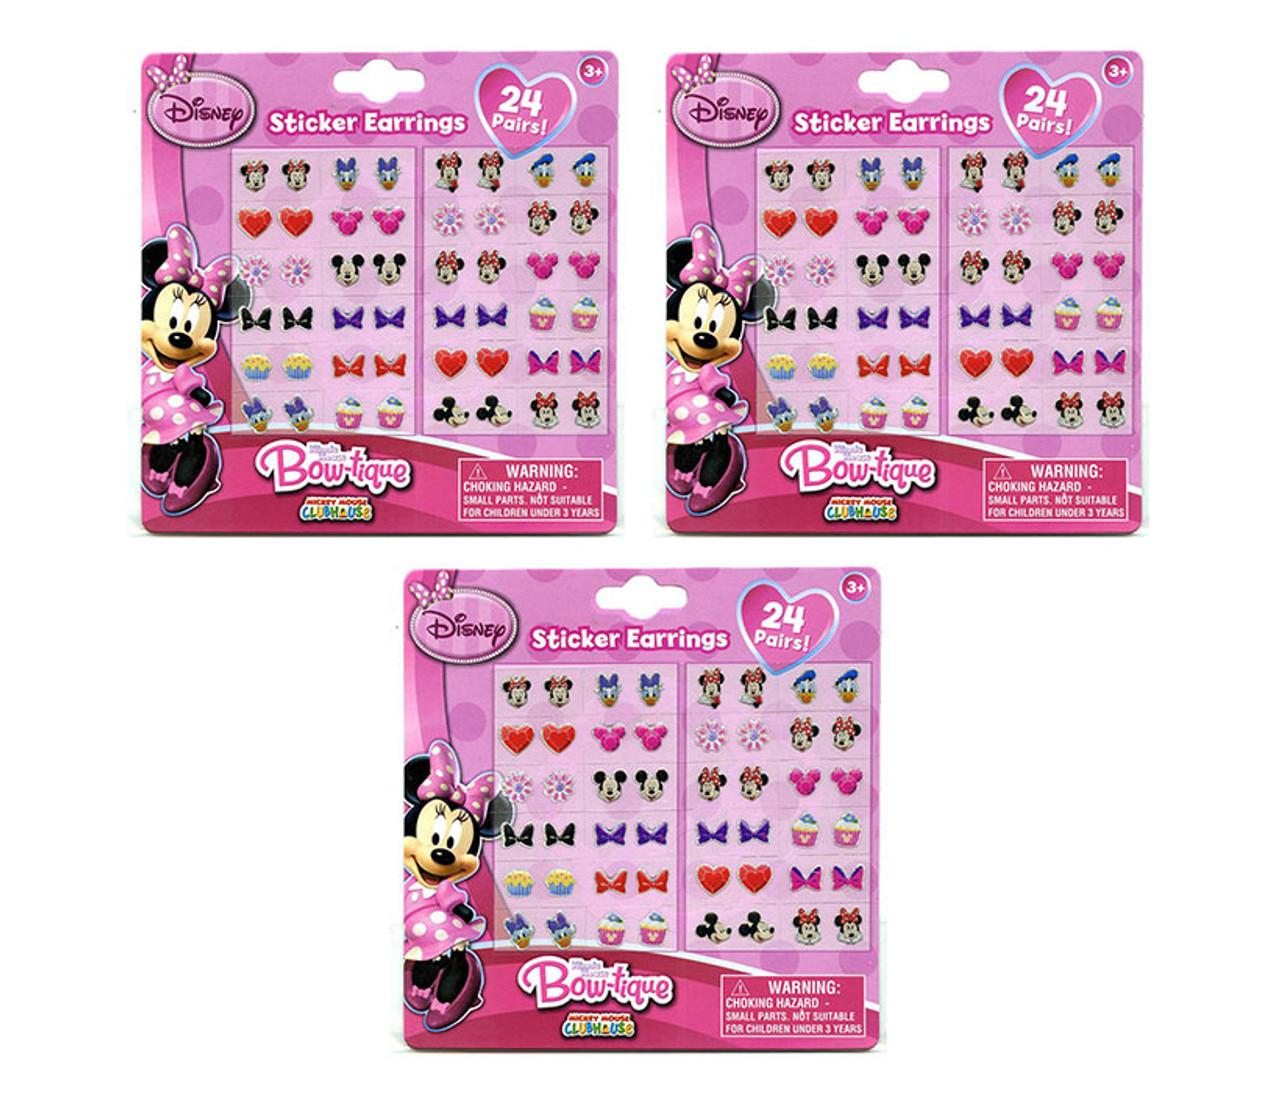 c4c181986 Disney Minnie Mouse Bowtique Sticker Earrings Set 3 Items Stick On Earrings